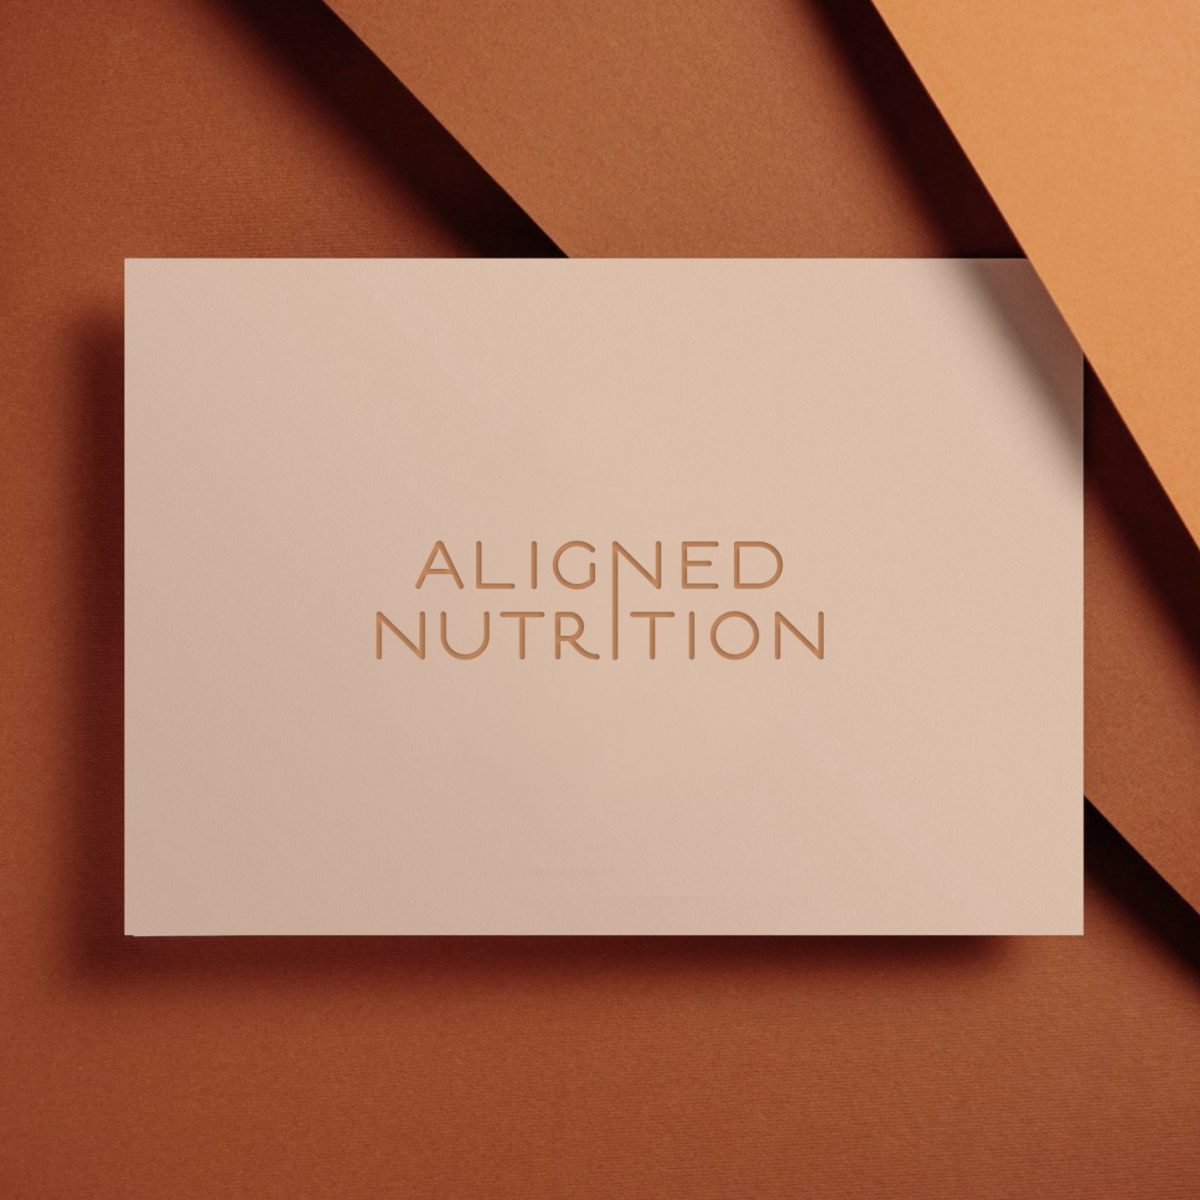 AlignedNutrition3